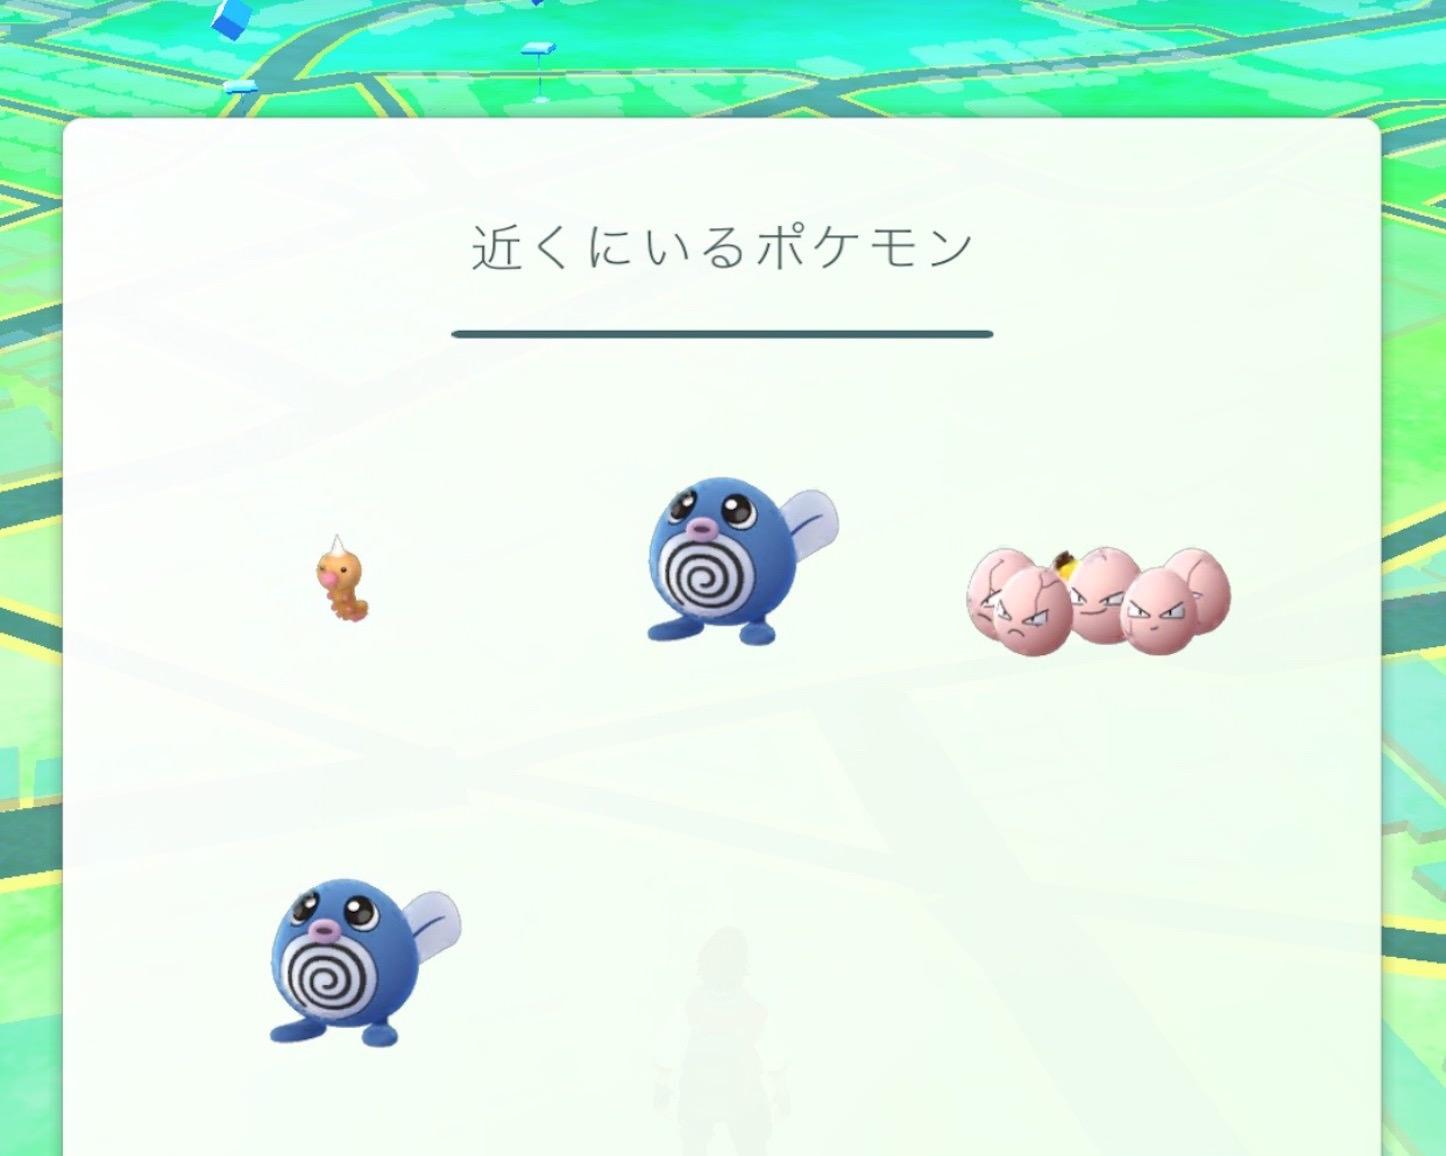 Nearby-Pokemon-with-no-footprints.jpg